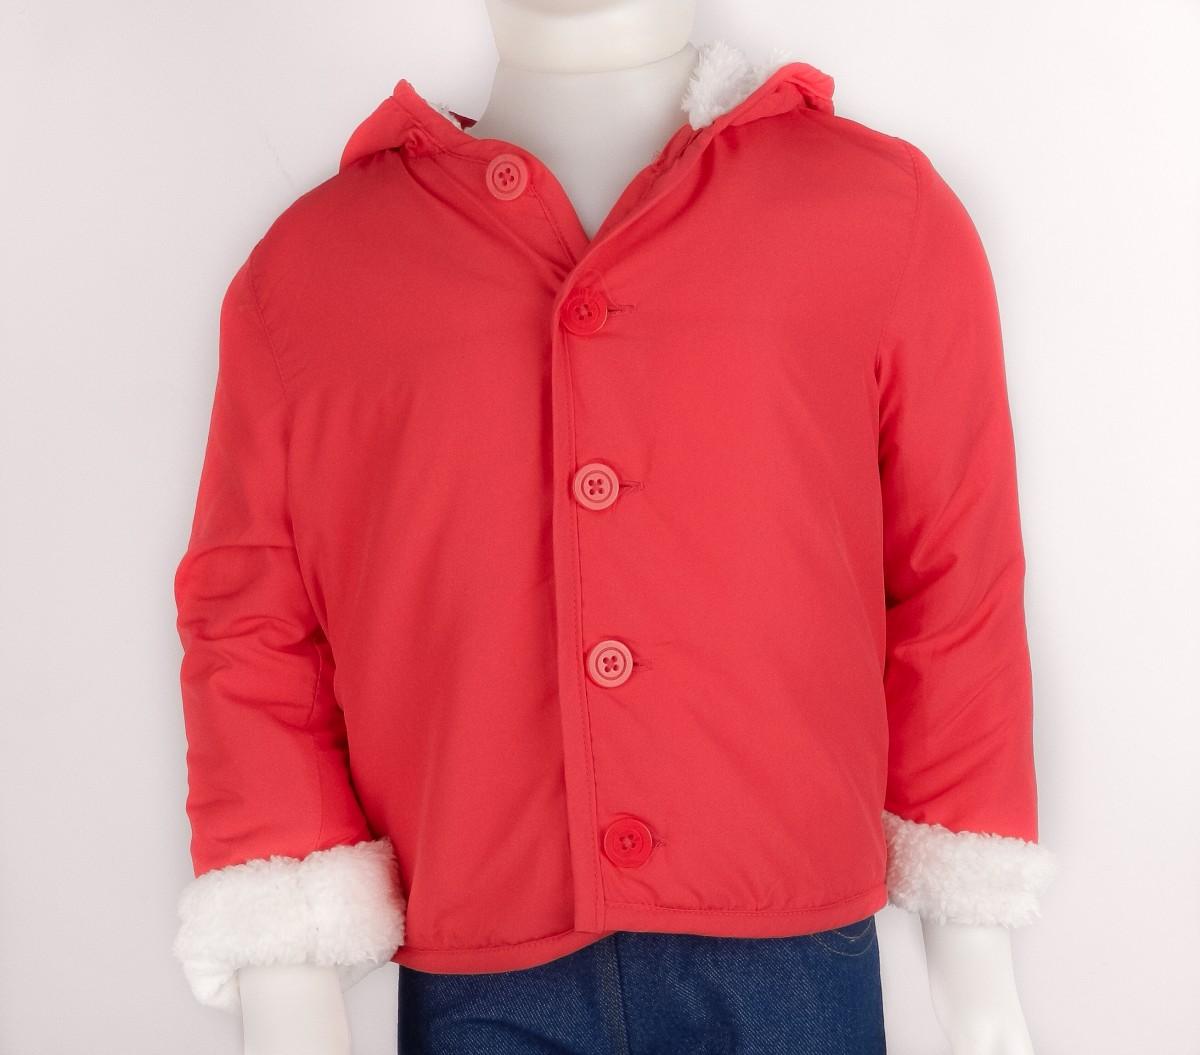 1c8a2e6538 Bizz Store - Jaqueta Infantil Feminina Hering Kids Com Pele